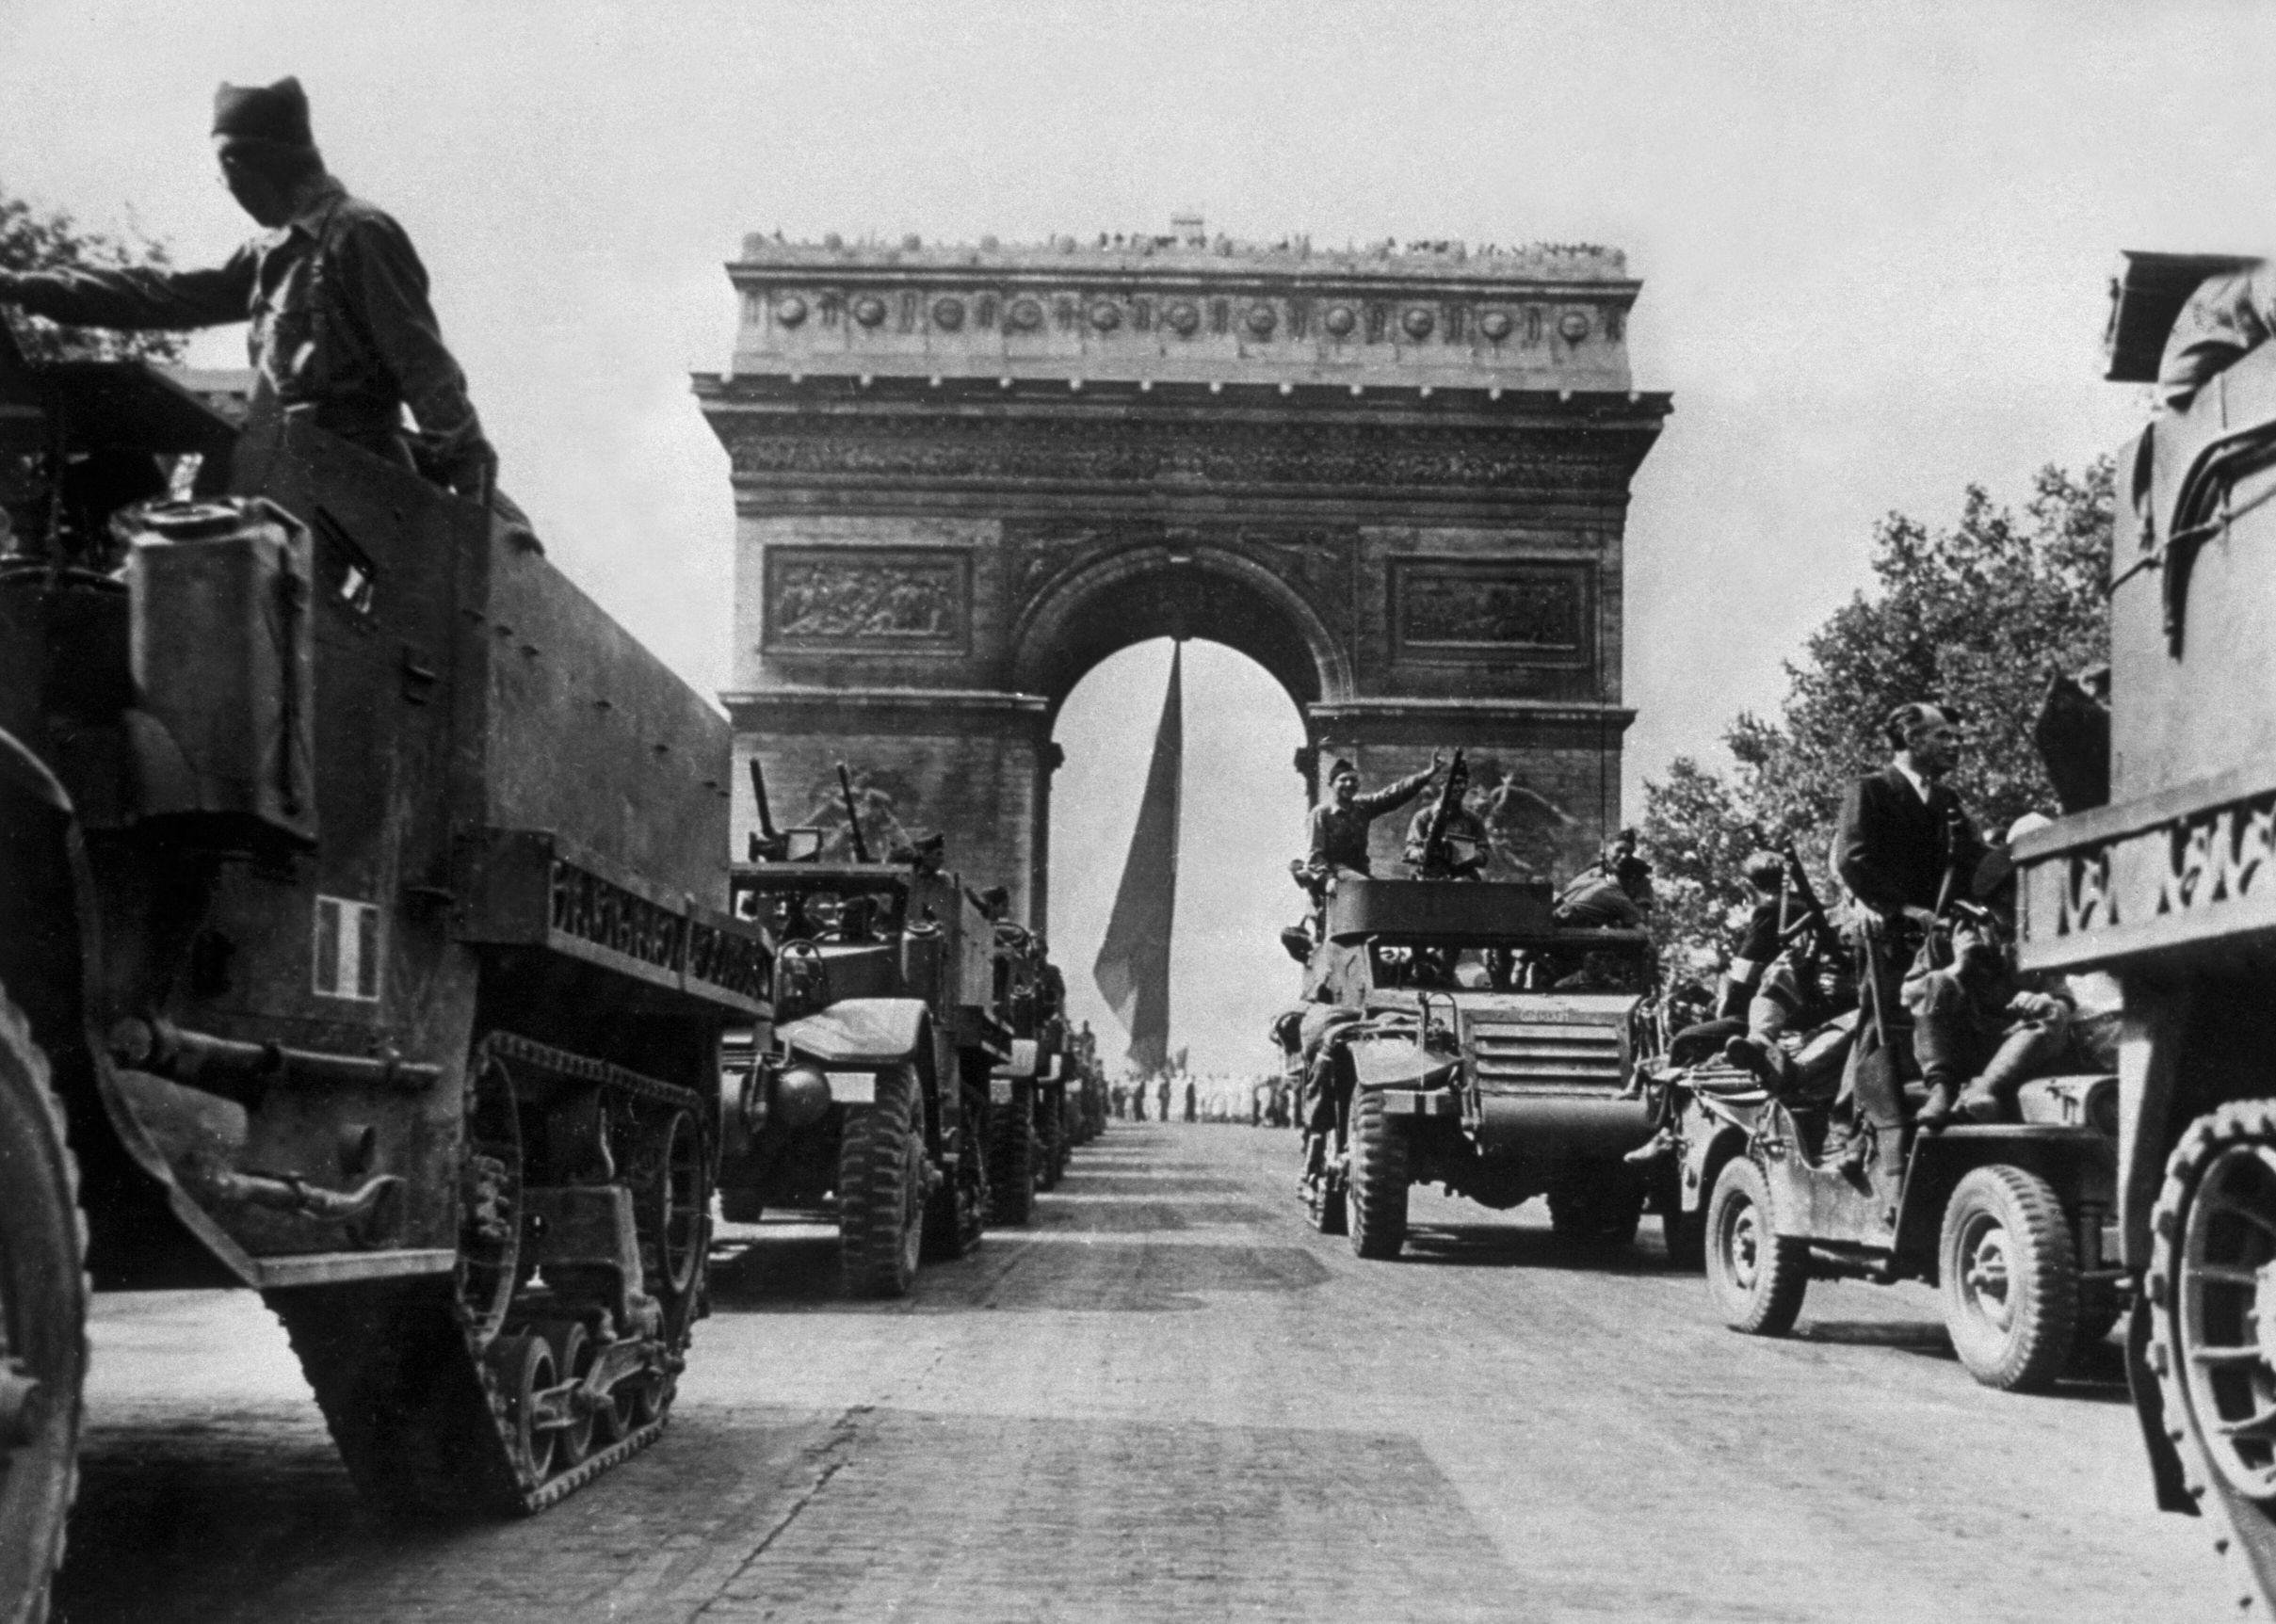 Triomphe Celebration